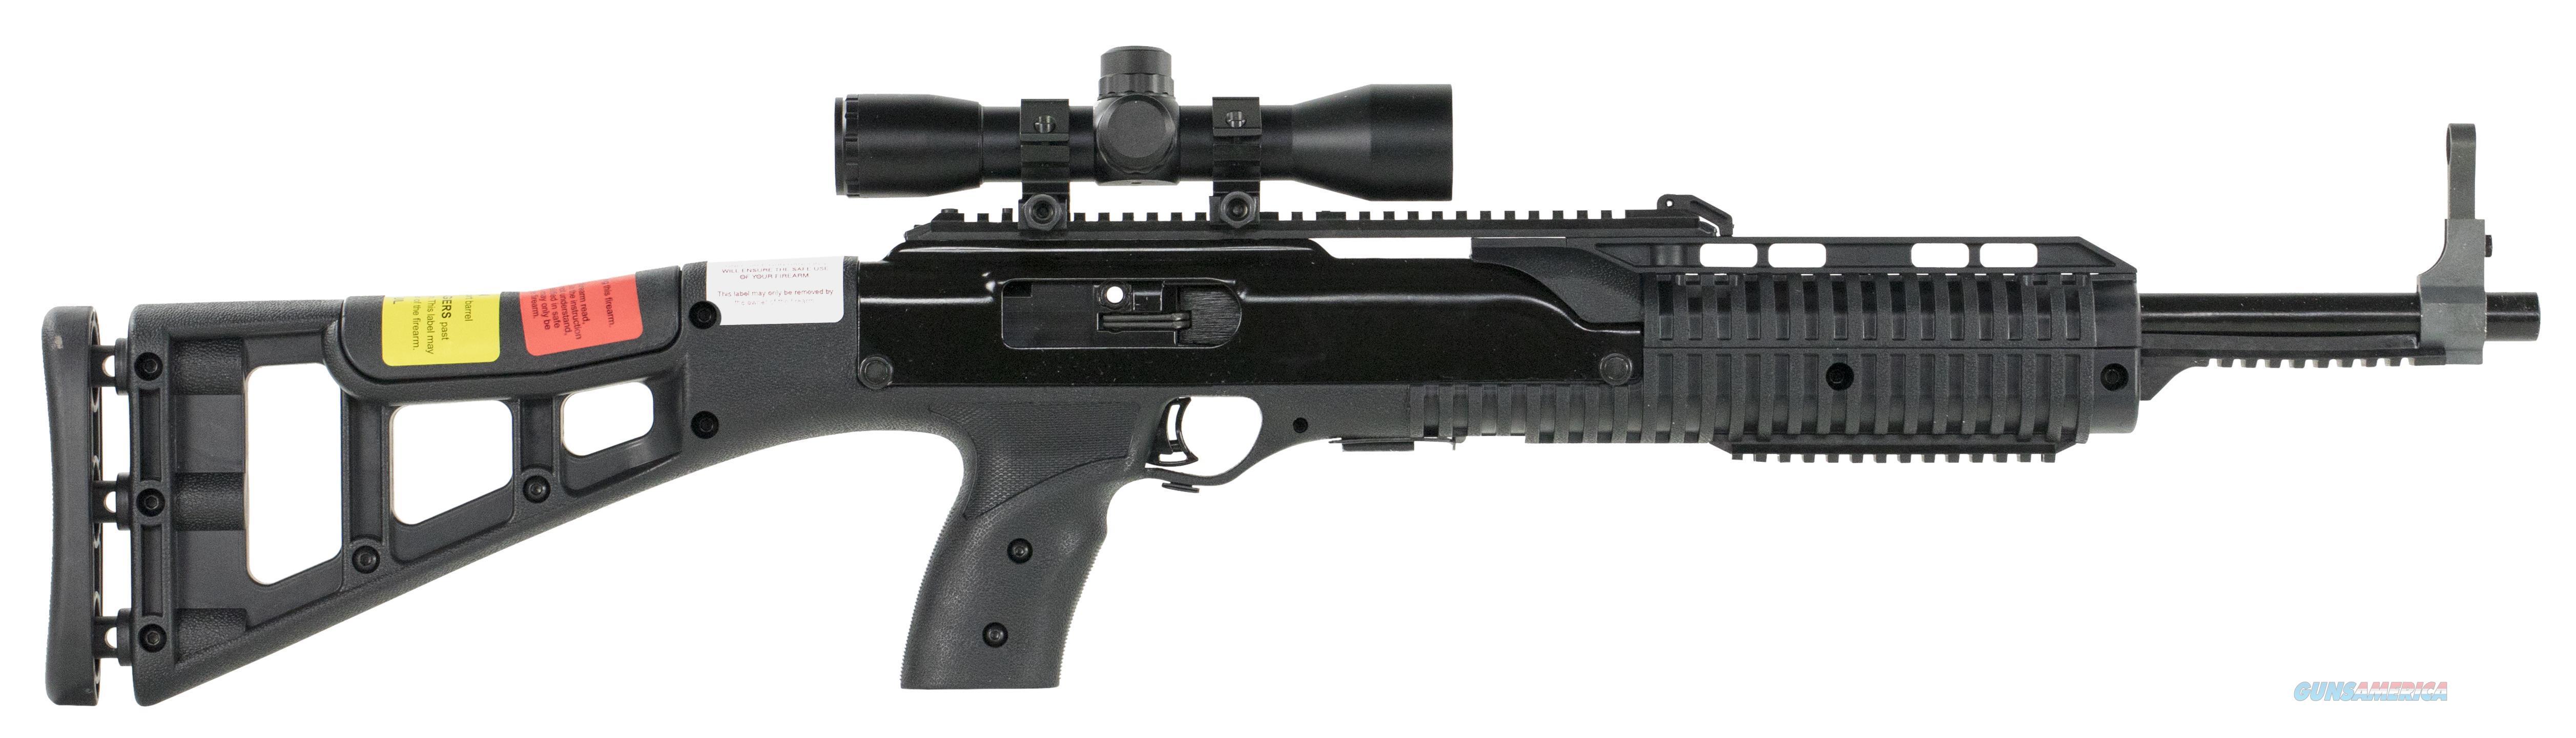 Hipoint Hi Point 9Mm Ts 16.5 Target Stock 4X Scope 995TS 4X  Guns > Rifles > H Misc Rifles